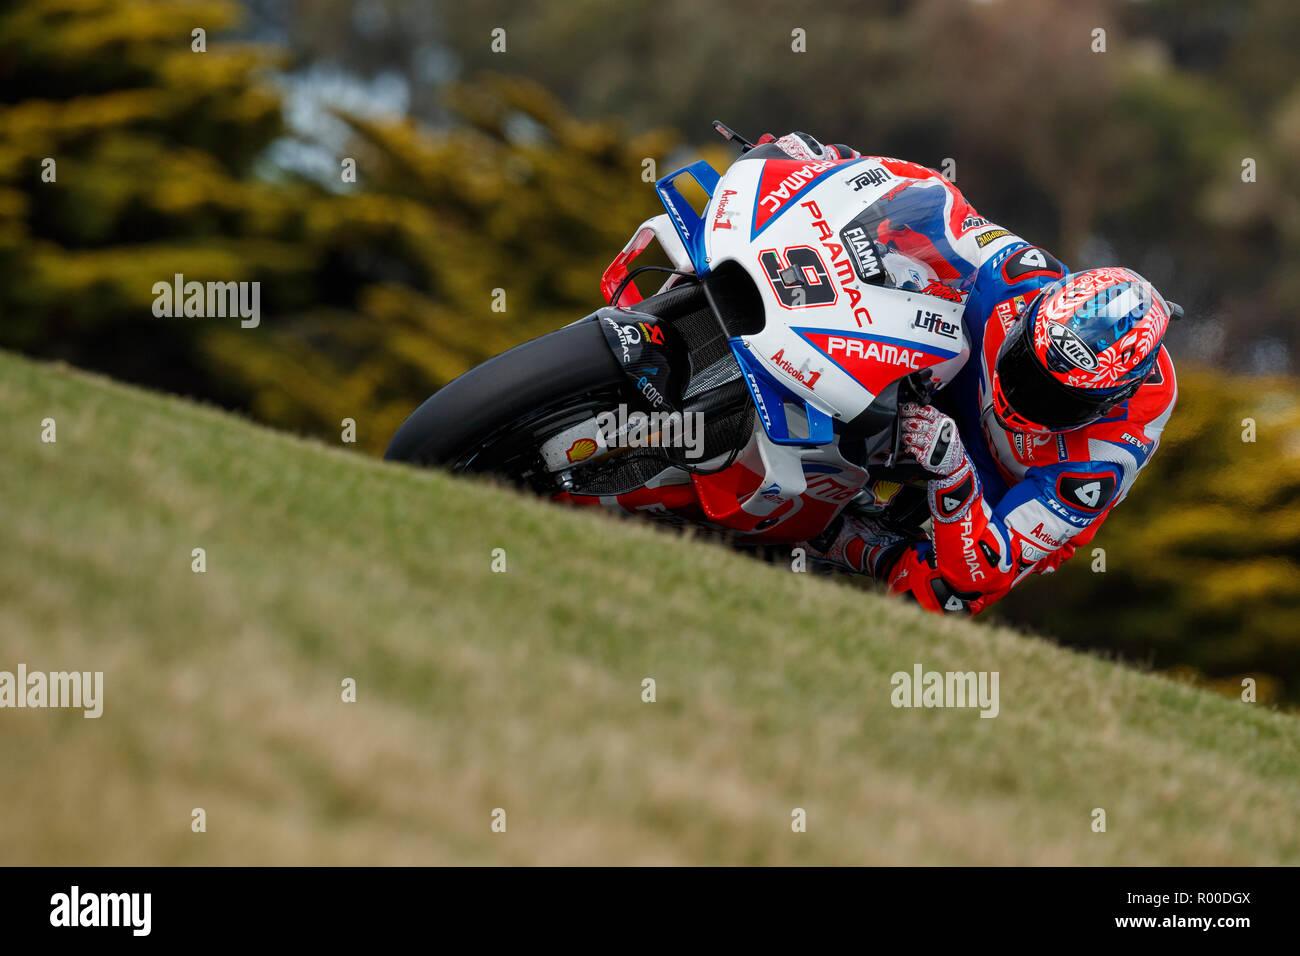 Friday, 26 October, 2018. Phillip Island, Australia. Danilo Petrucci, Alma Pramac Racing MotoGP Team. Free practice 2. - Stock Image